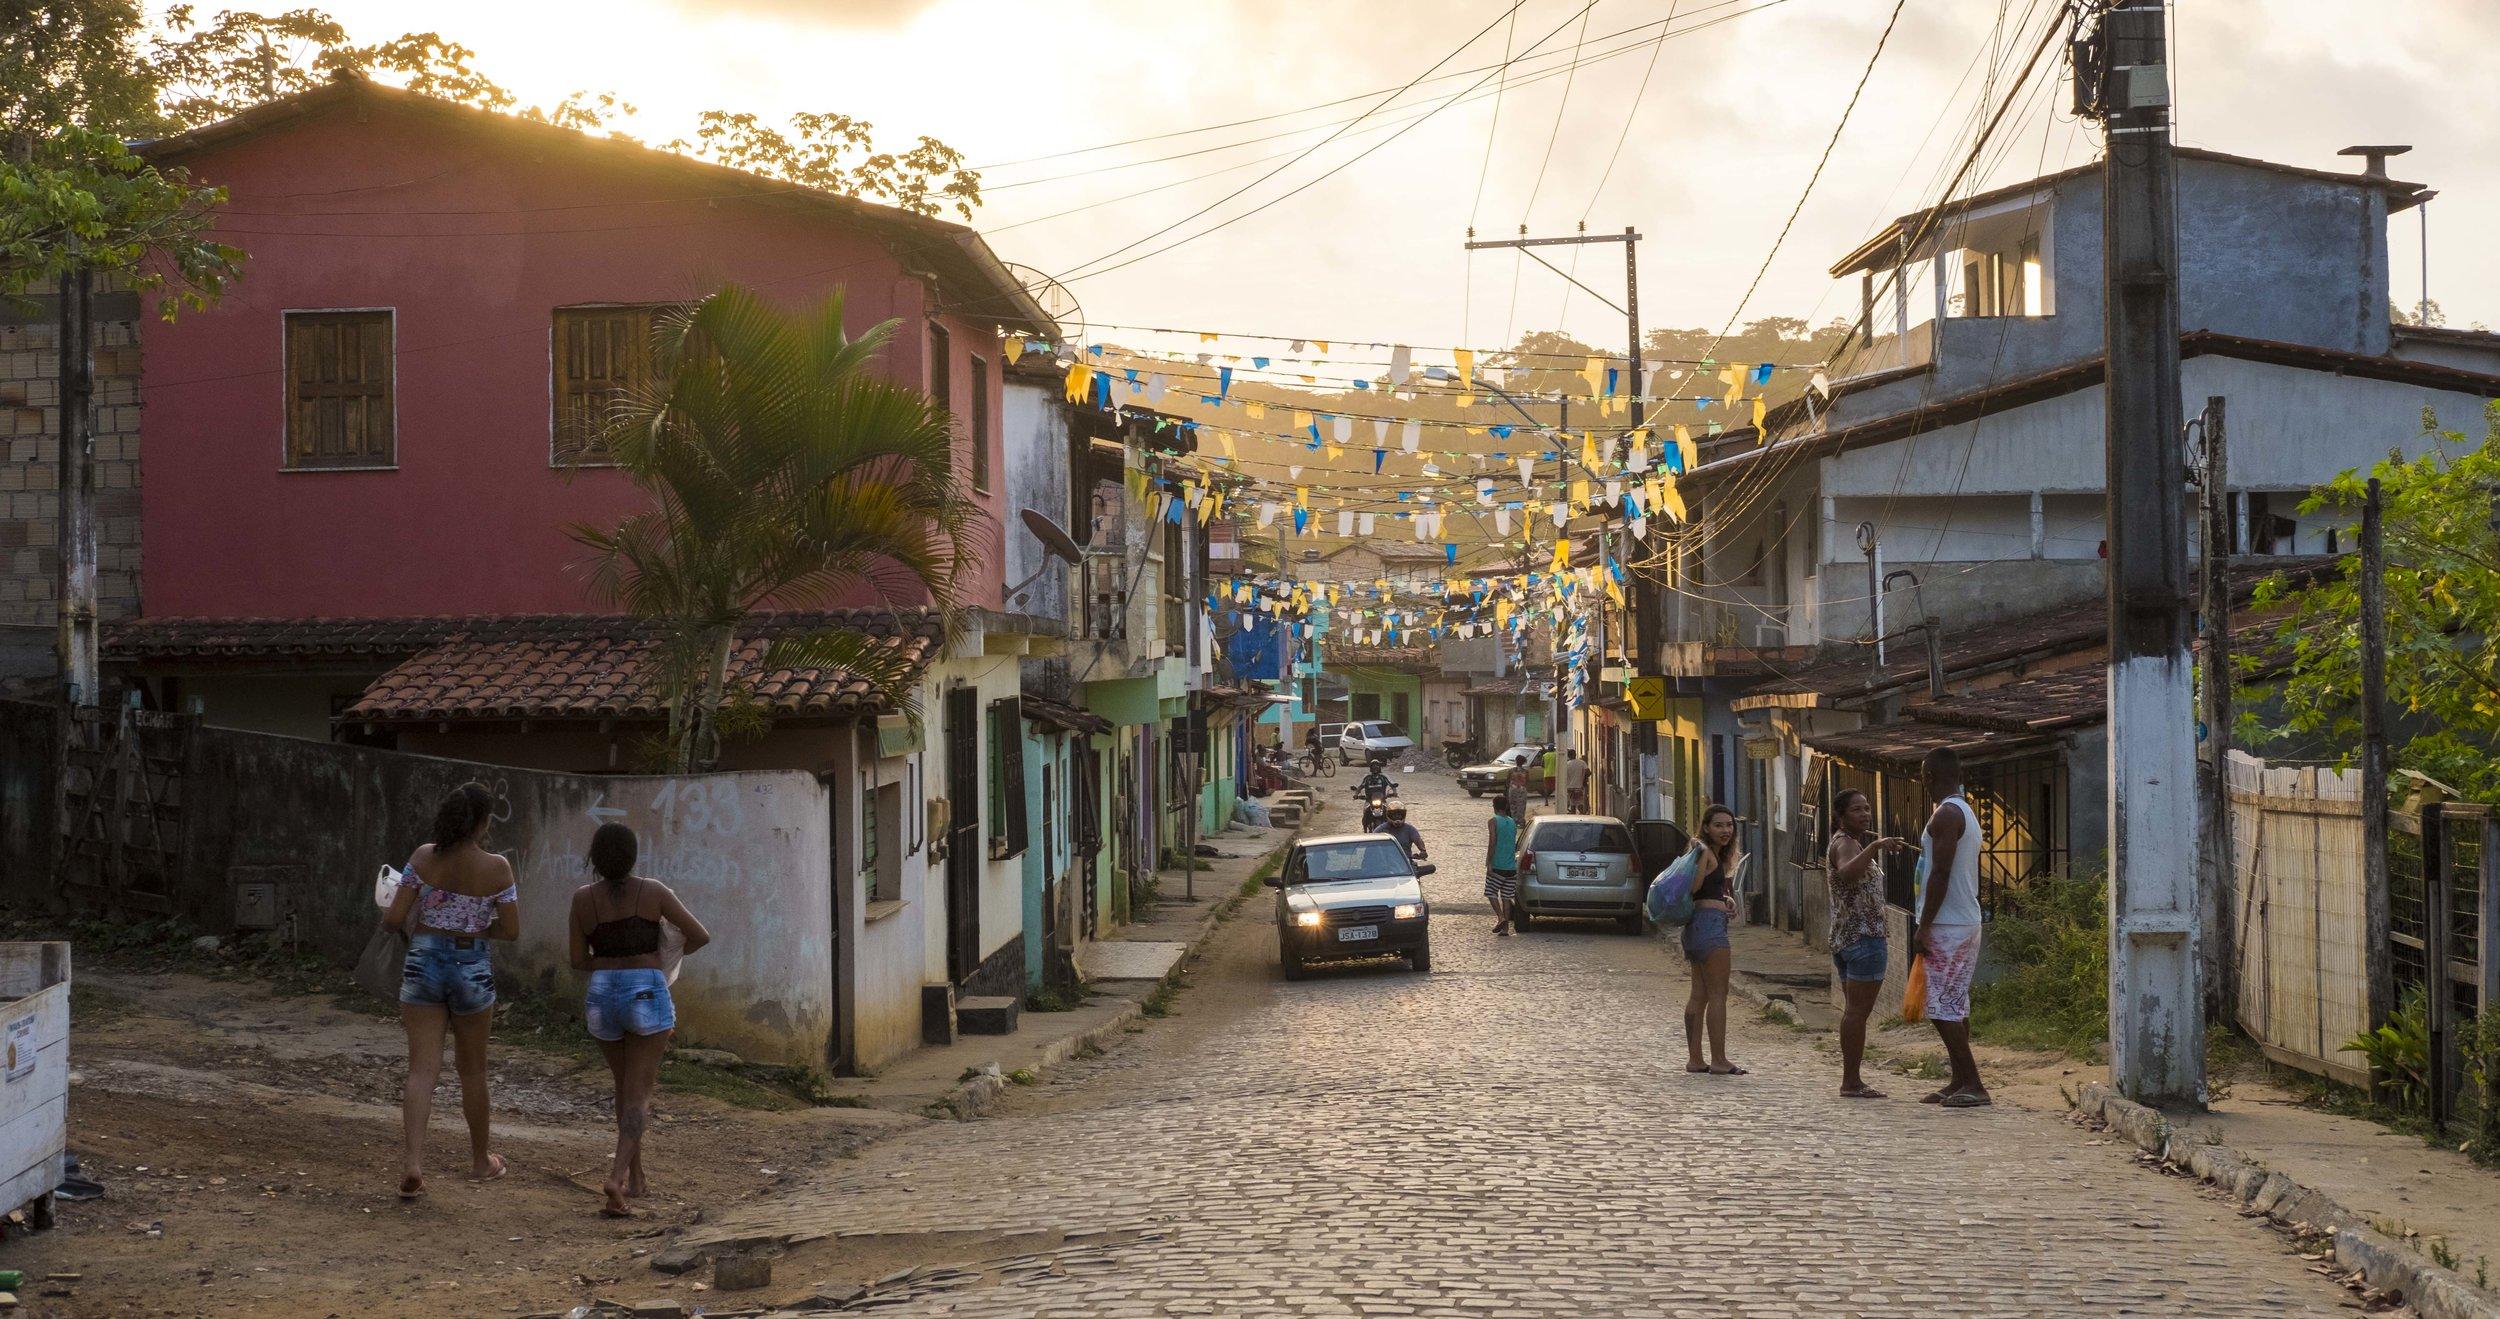 Bairro Passagem, Itacaré, Bahia, Brazil